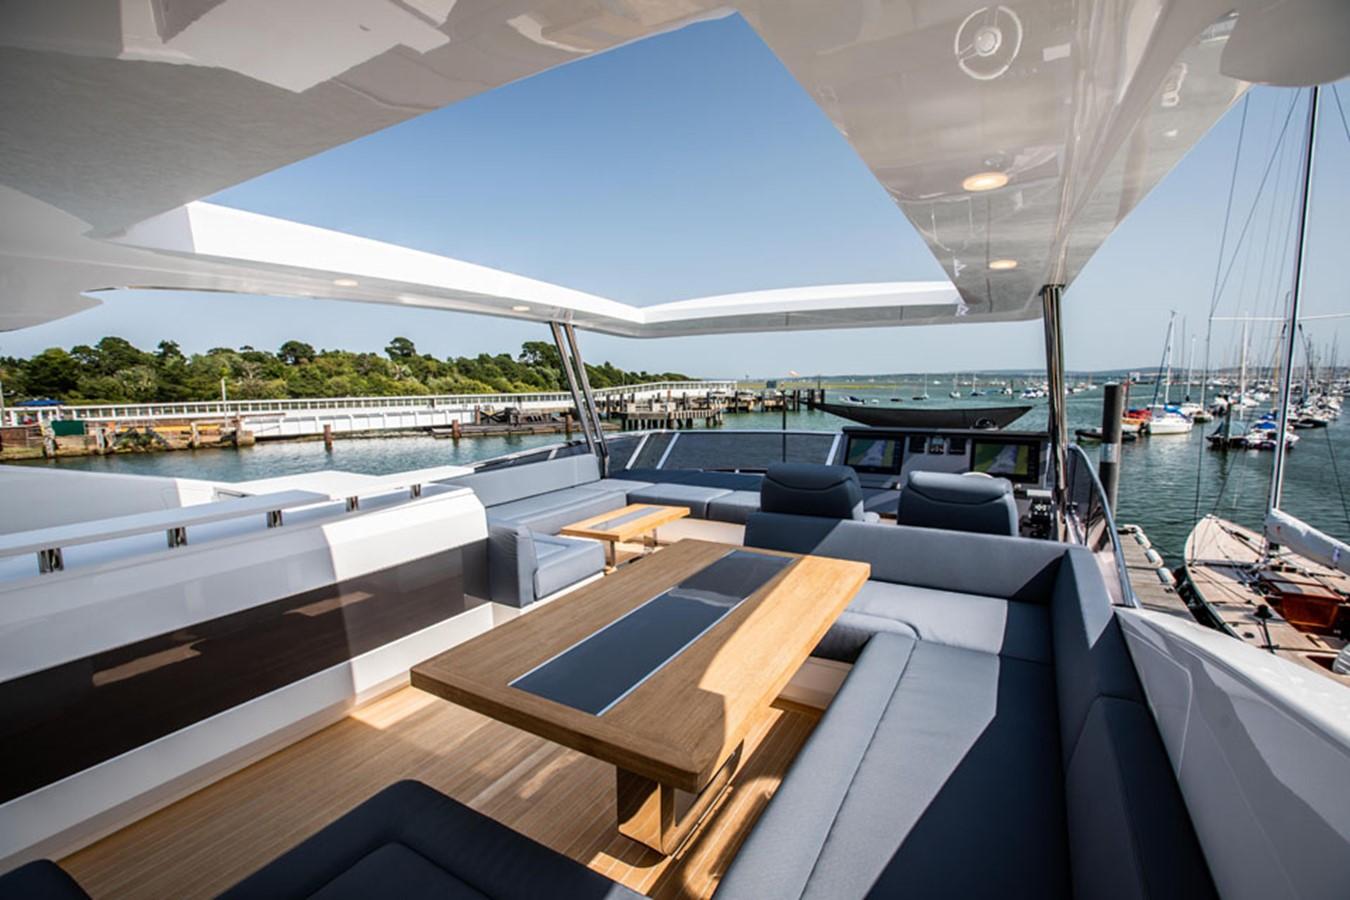 2019 PEARL MOTOR YACHTS Pearl 80 Motor Yacht 2615325